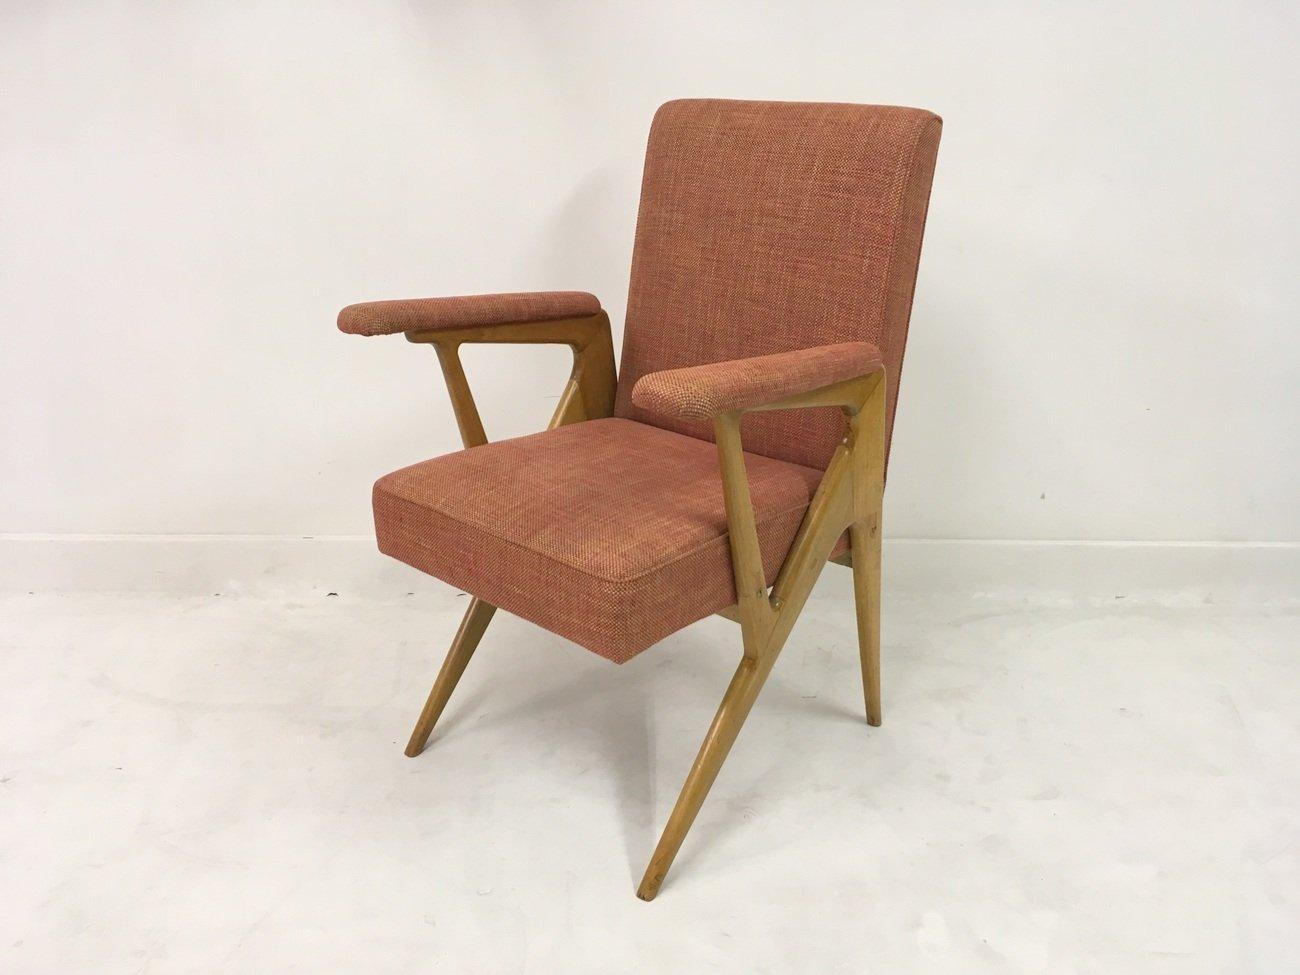 italienischer sessel 1950er bei pamono kaufen. Black Bedroom Furniture Sets. Home Design Ideas